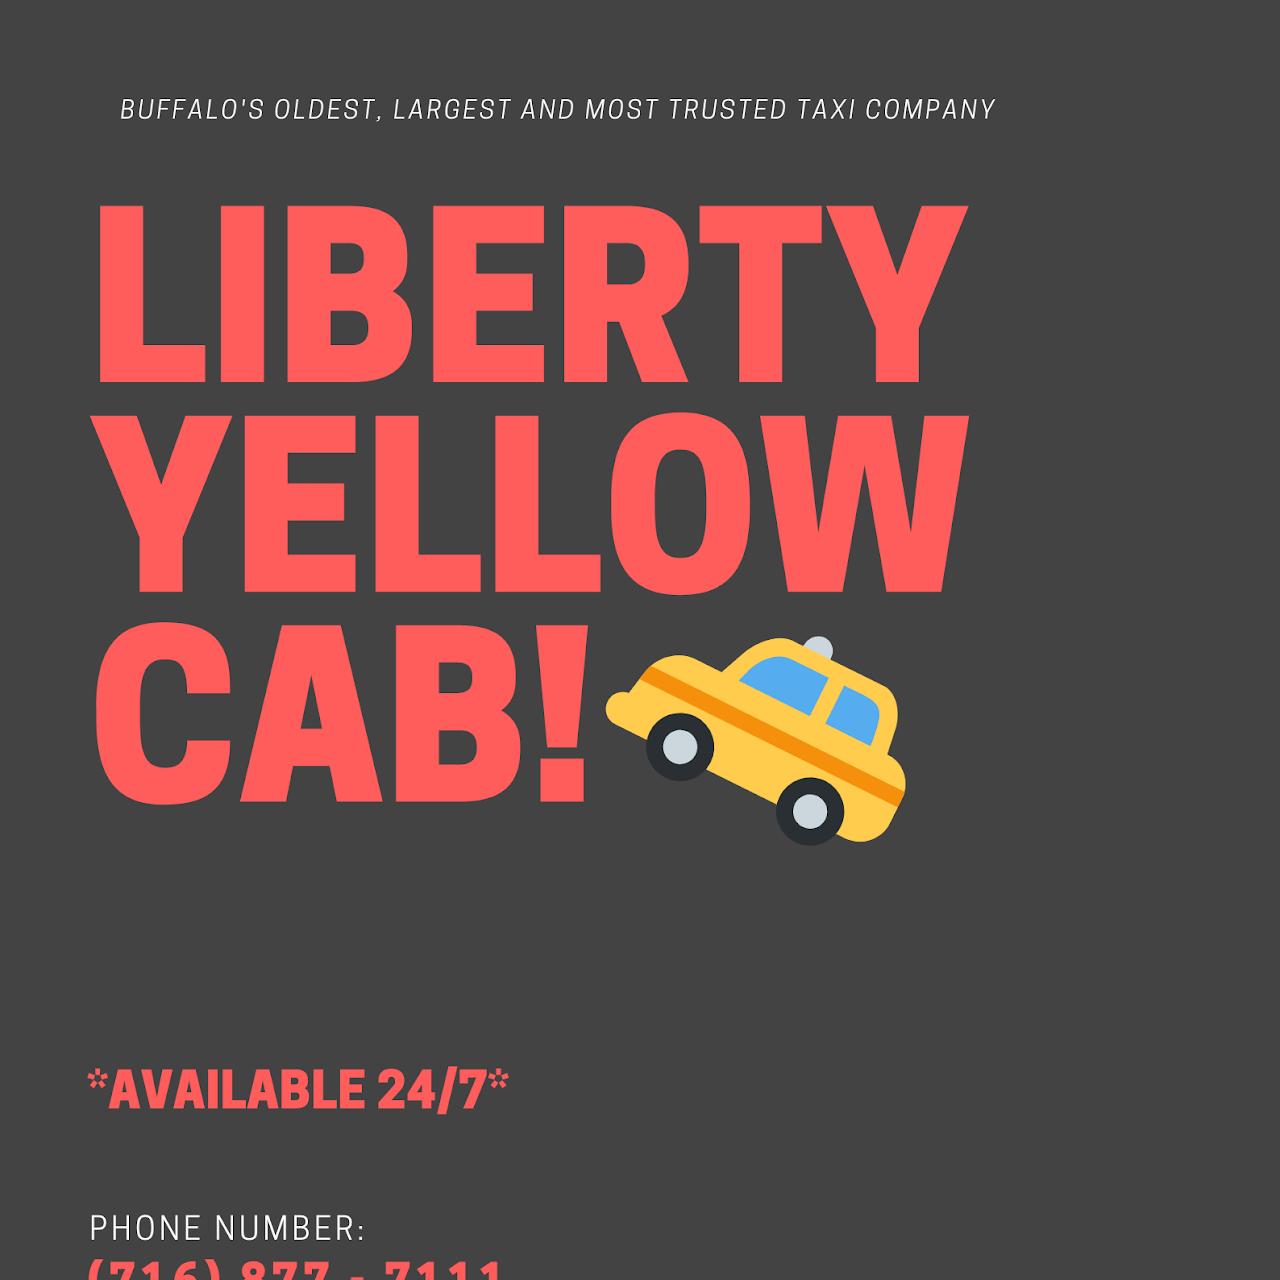 Liberty Yellow Cab Buffalo Taxi Medicaid Transportation